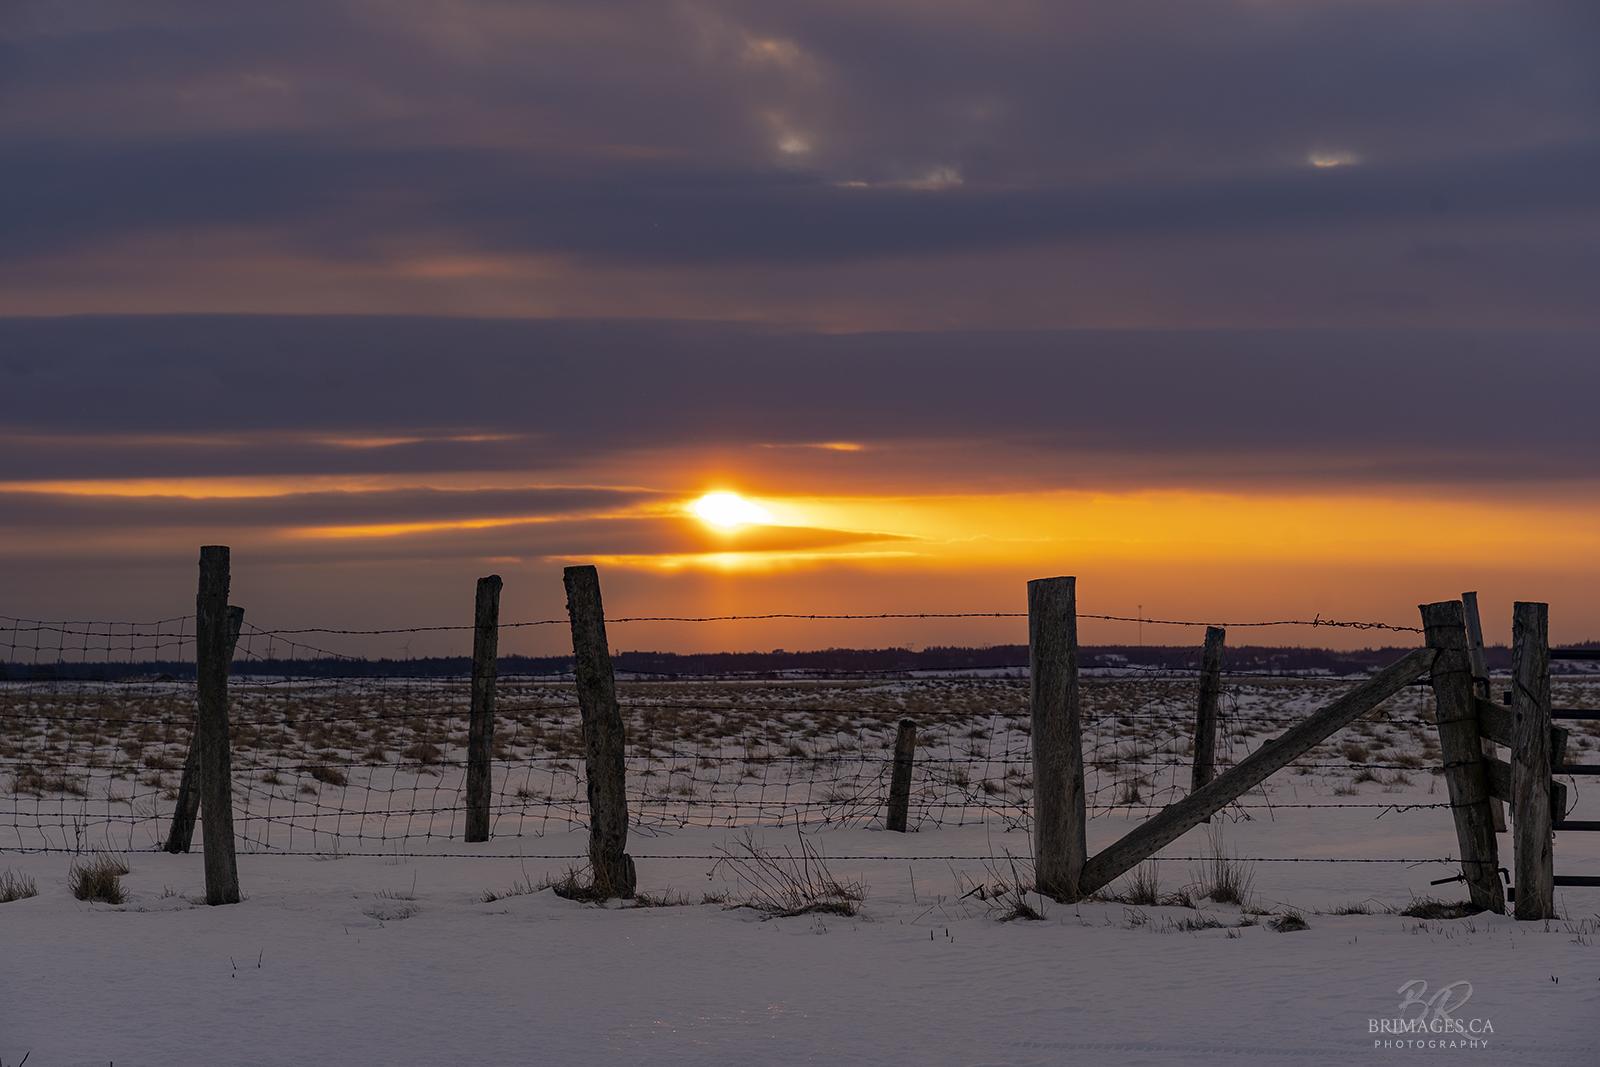 sunrise-new-brunswick-BRimages.ca